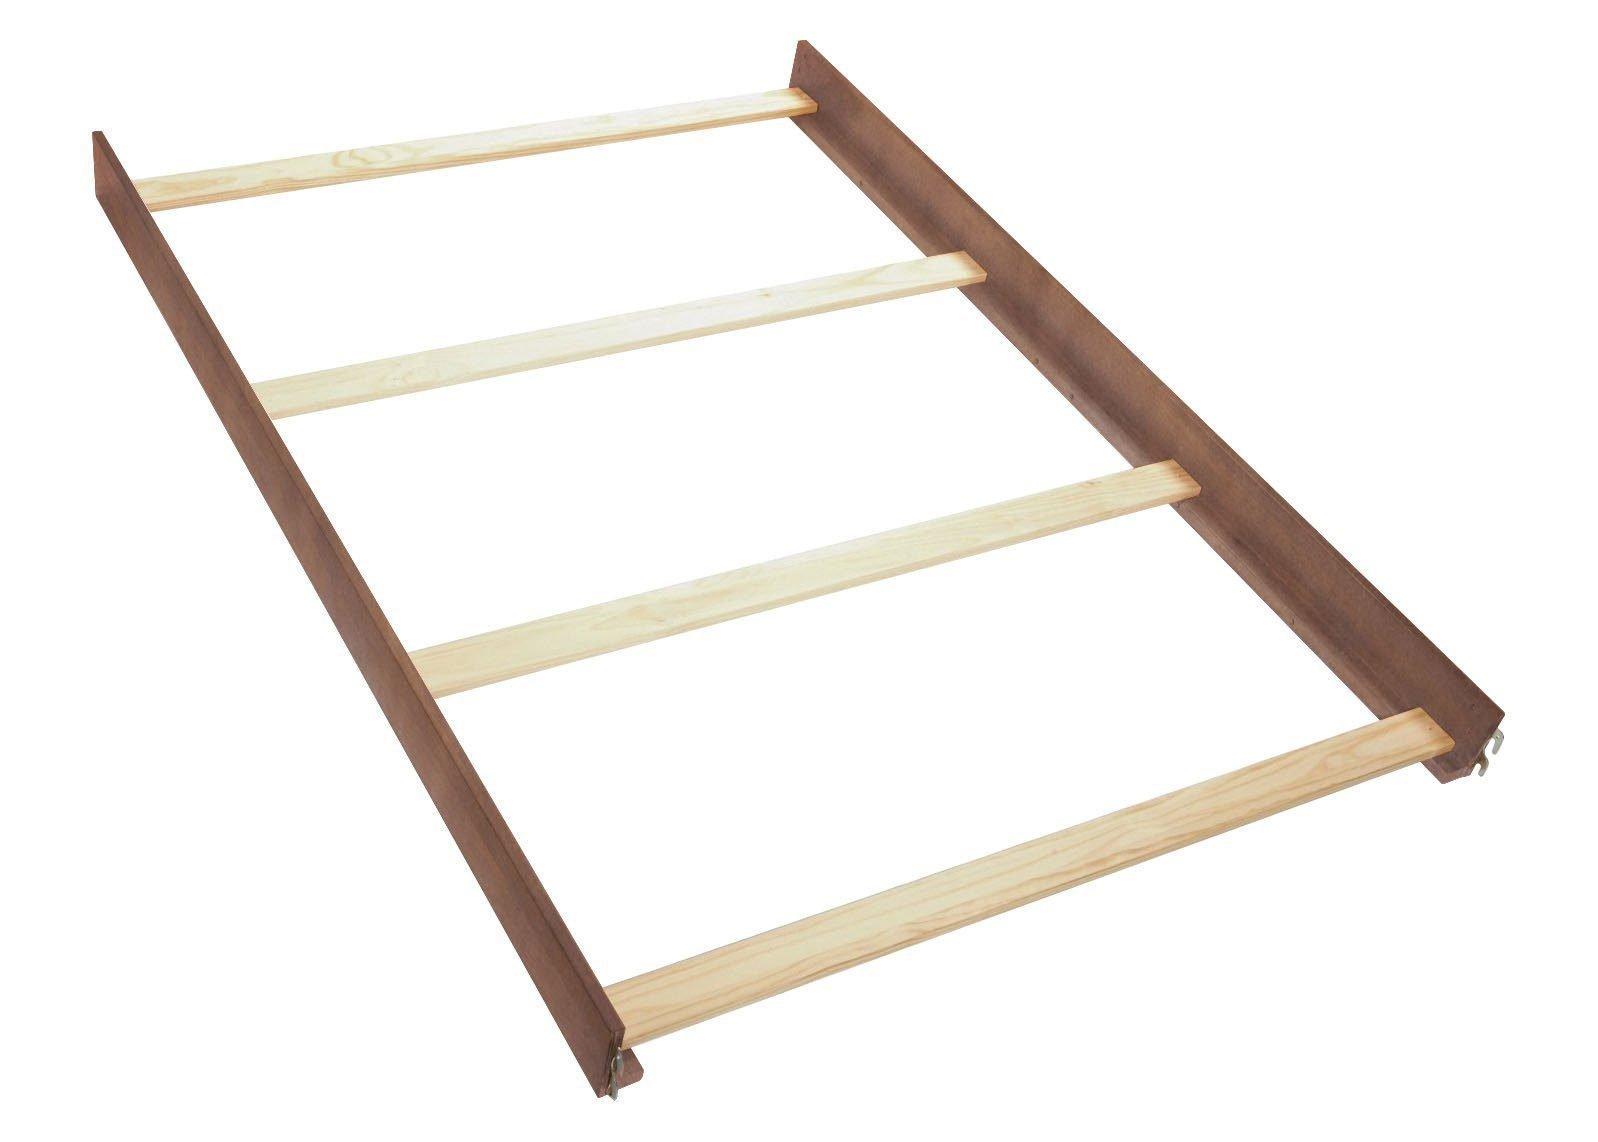 Simmons/Delta Childrens Chateau Crib-N-More Crib Full Size Conversion Kit Bed Rails - Walnut